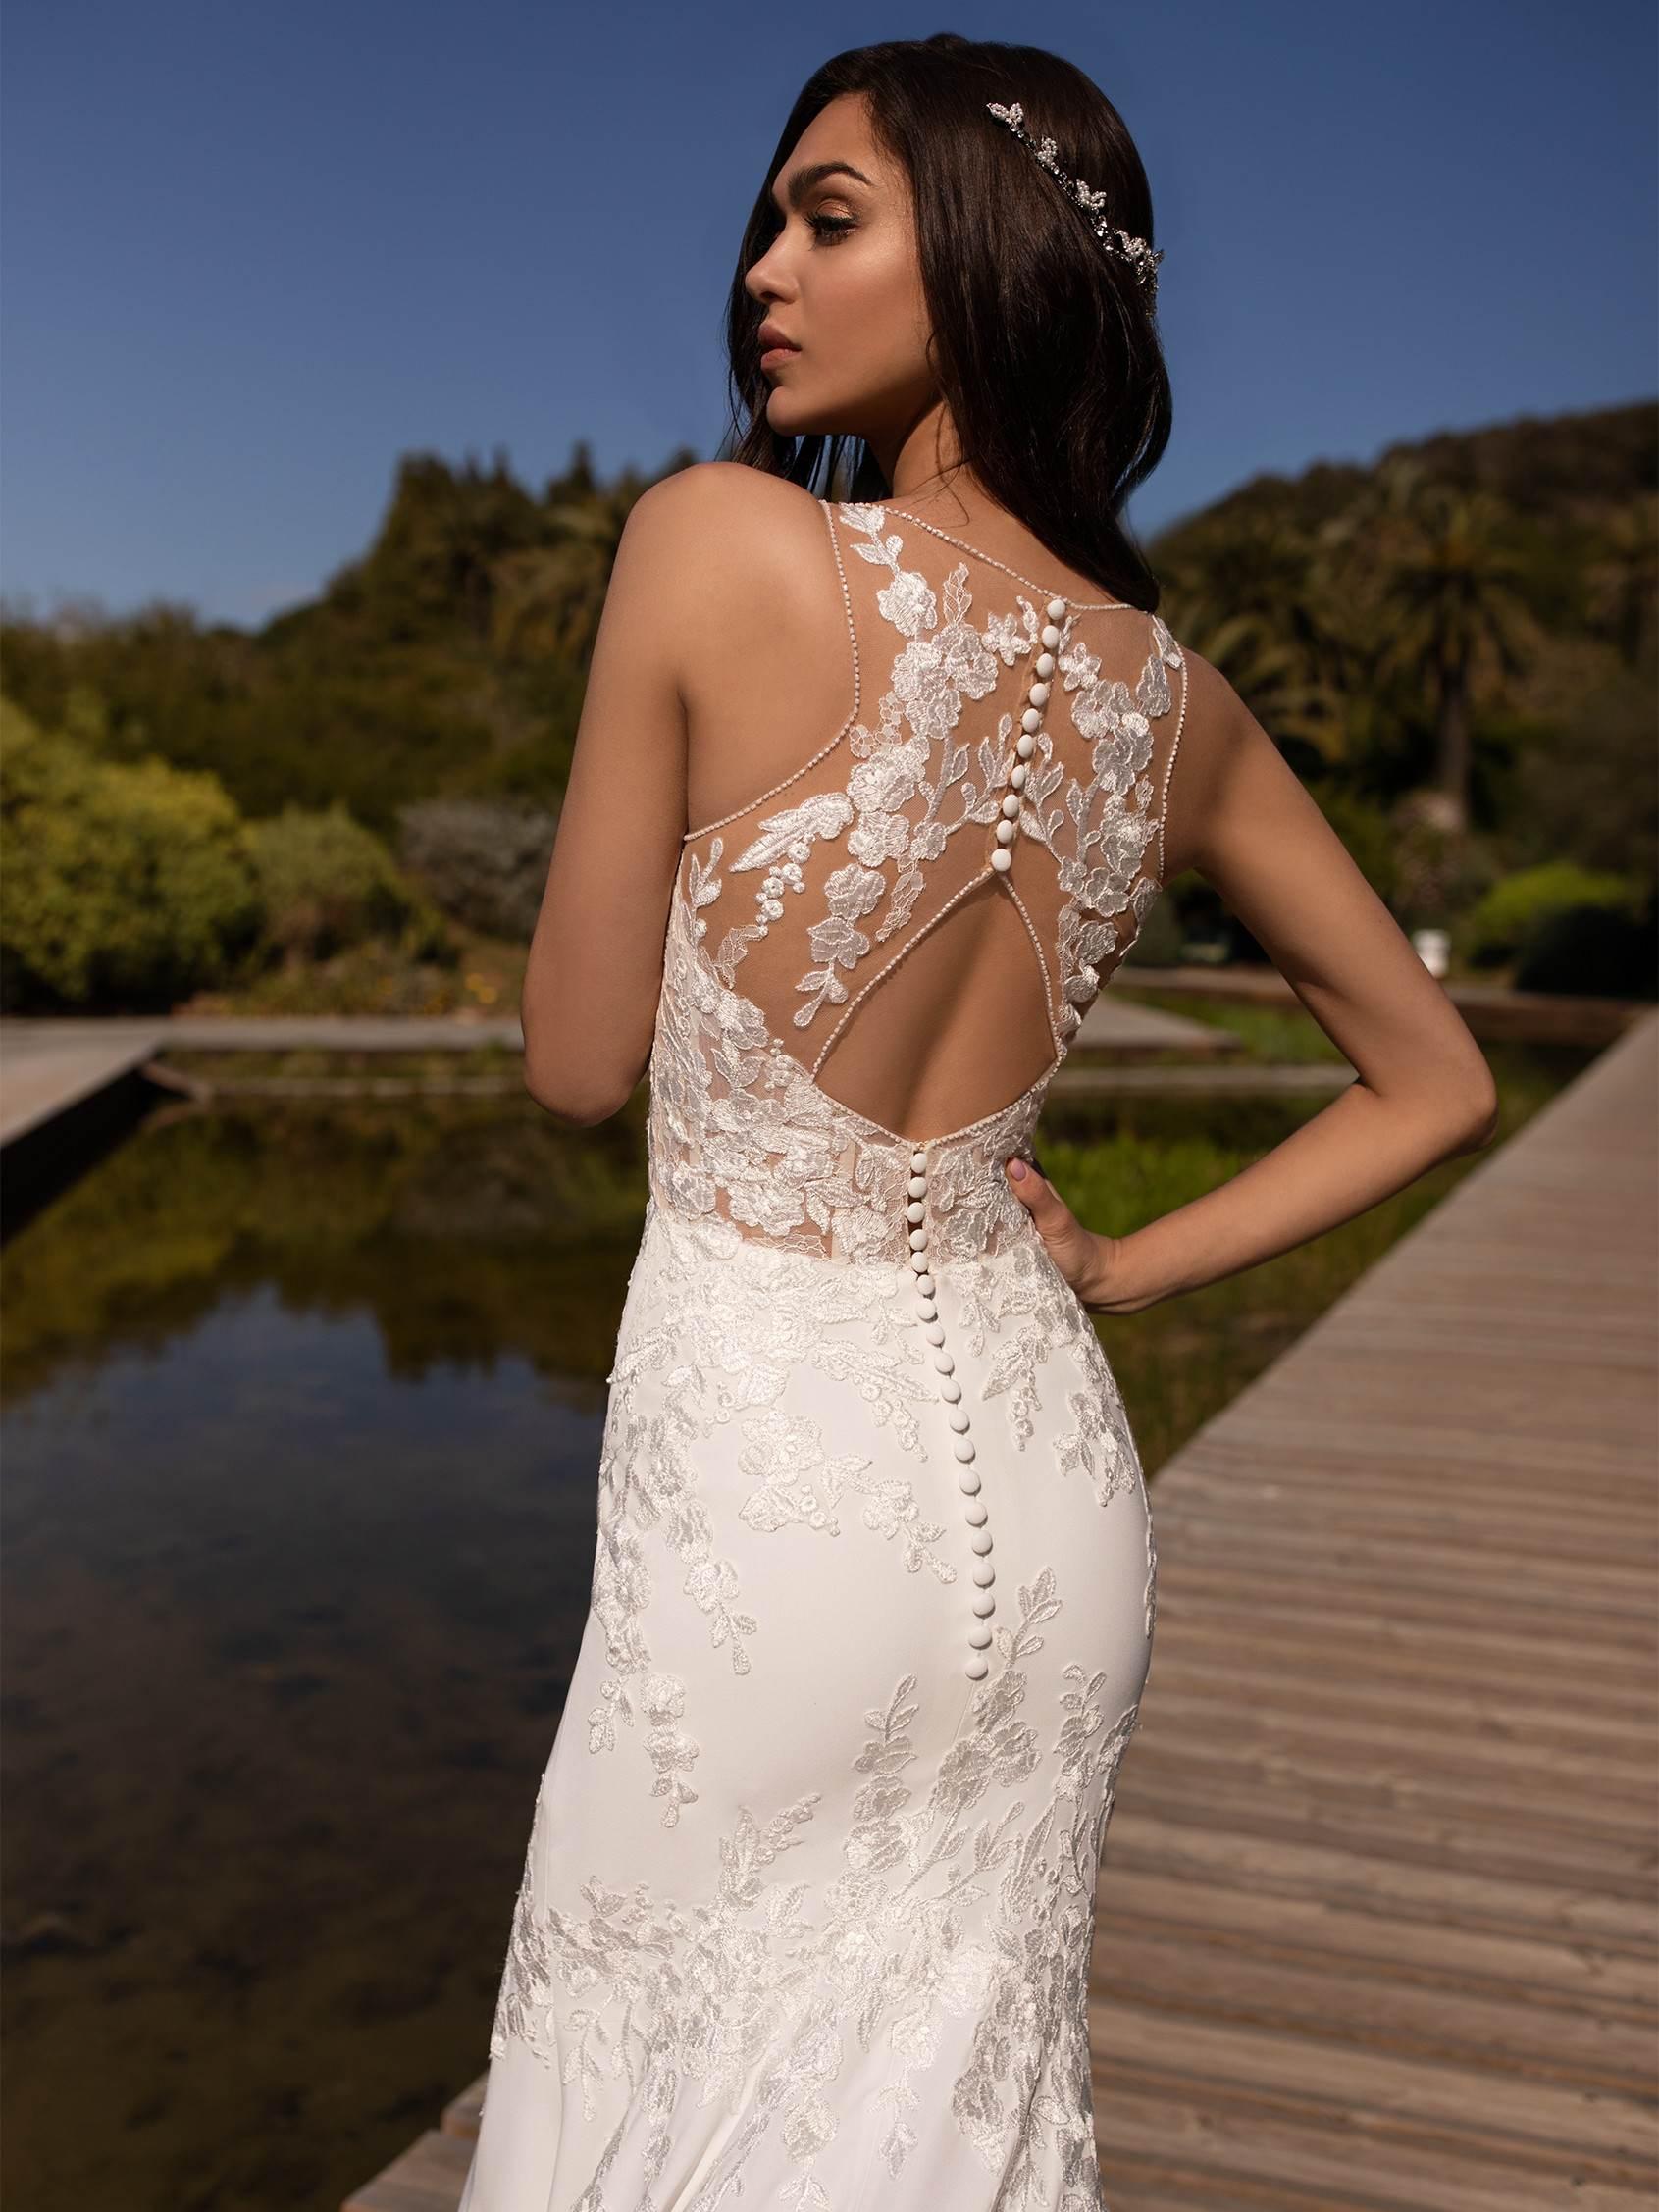 Alcyone esküvői ruha - Pronovias 2021